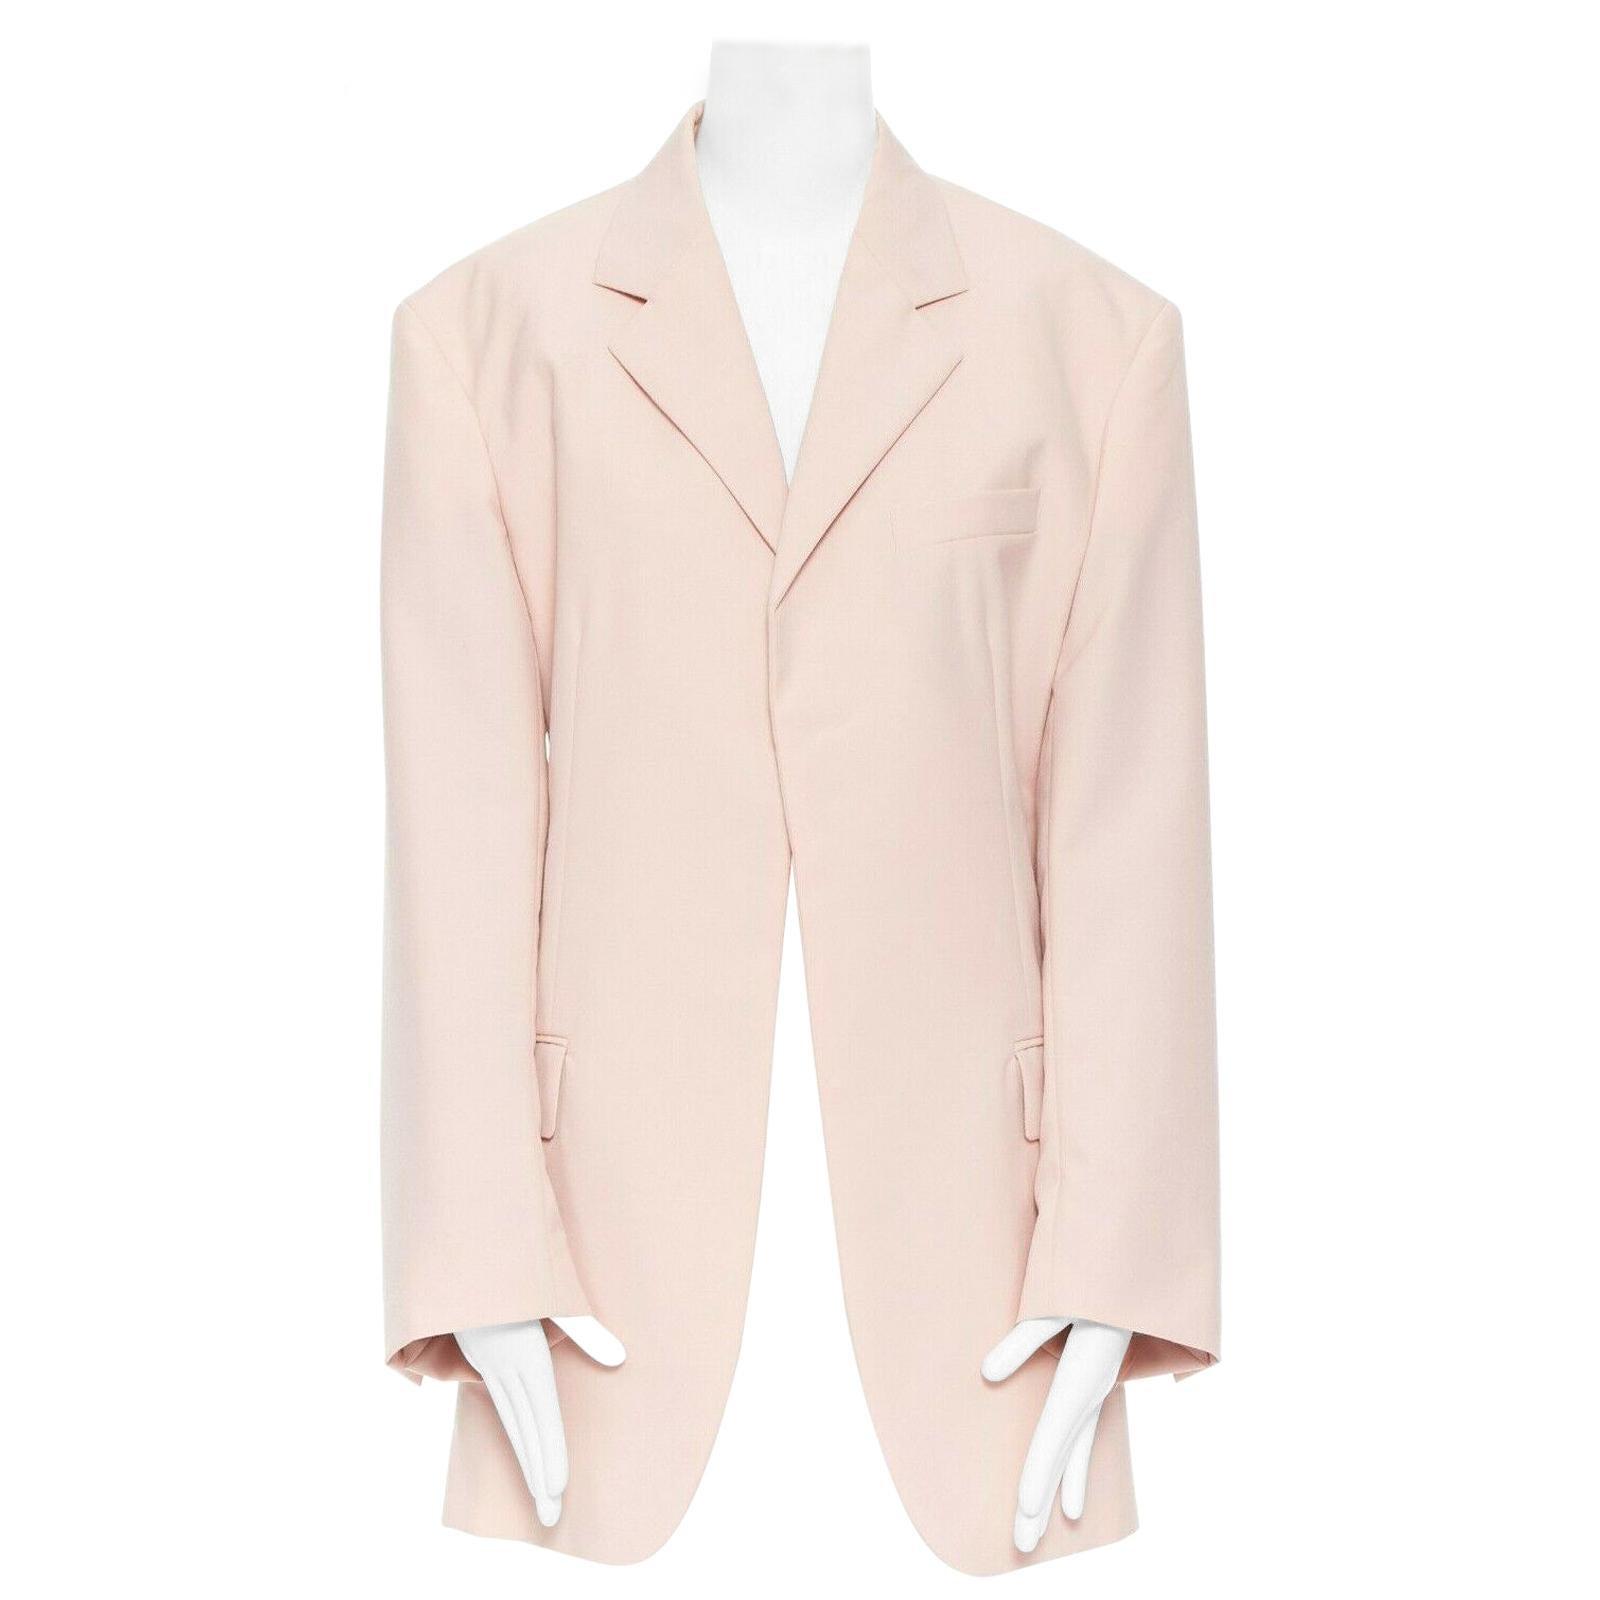 runway CELINE SS18 minimal soft pink oversized boyfriend blazer jacket FR36 S